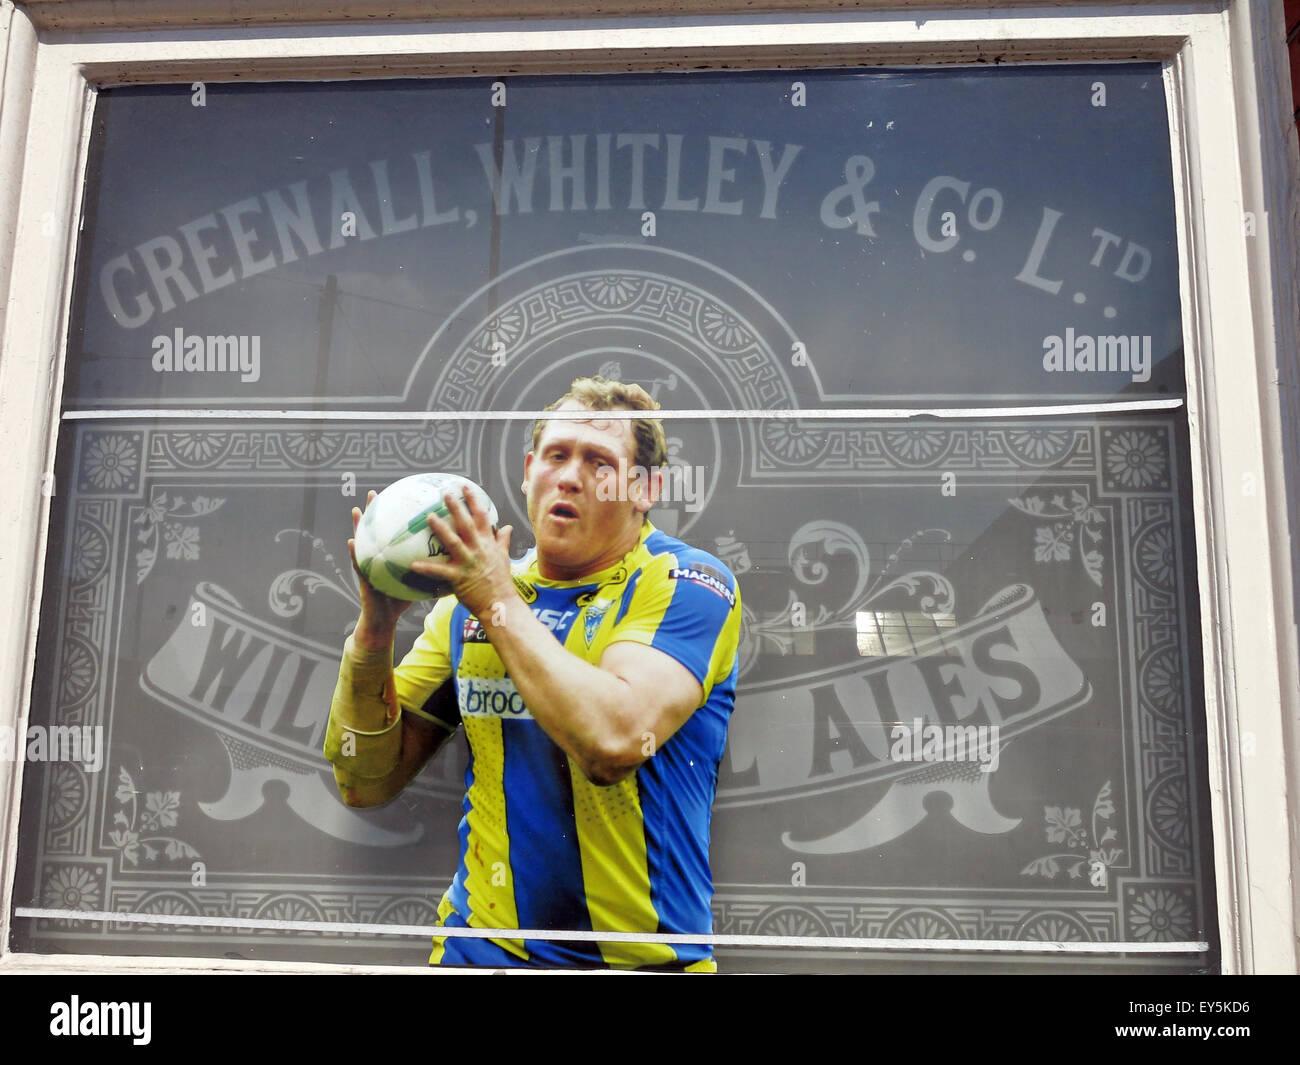 Laden Sie dieses Alamy Stockfoto Greenall, Whitley, Wilderspool Ales, Rugby, Draht-Spieler im Pub-Fenster - EY5KD6